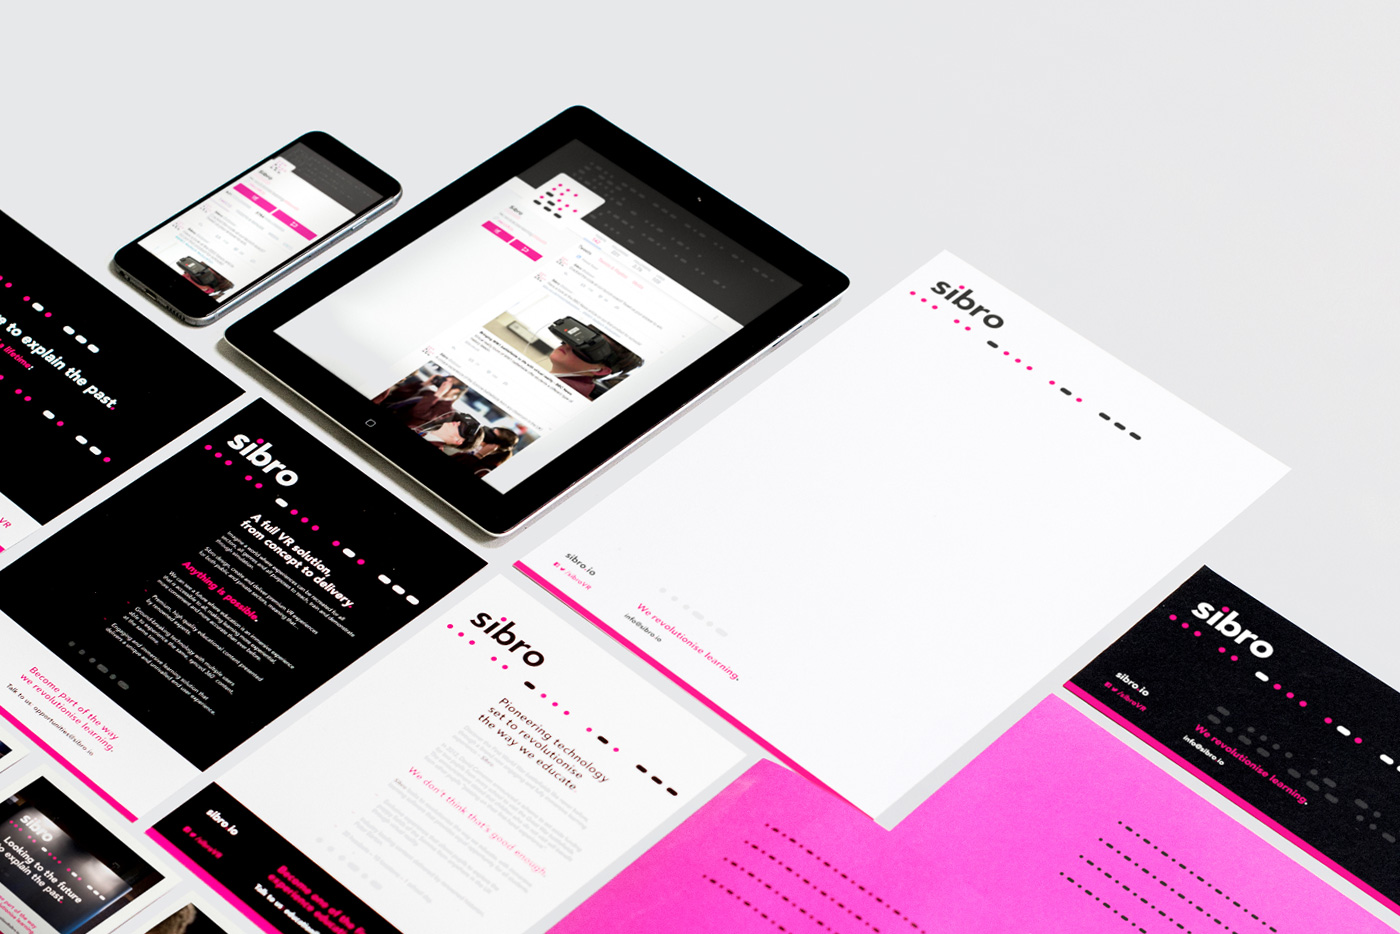 Sibro launch and branding - by freelance Graphic Designer Chris Nixon